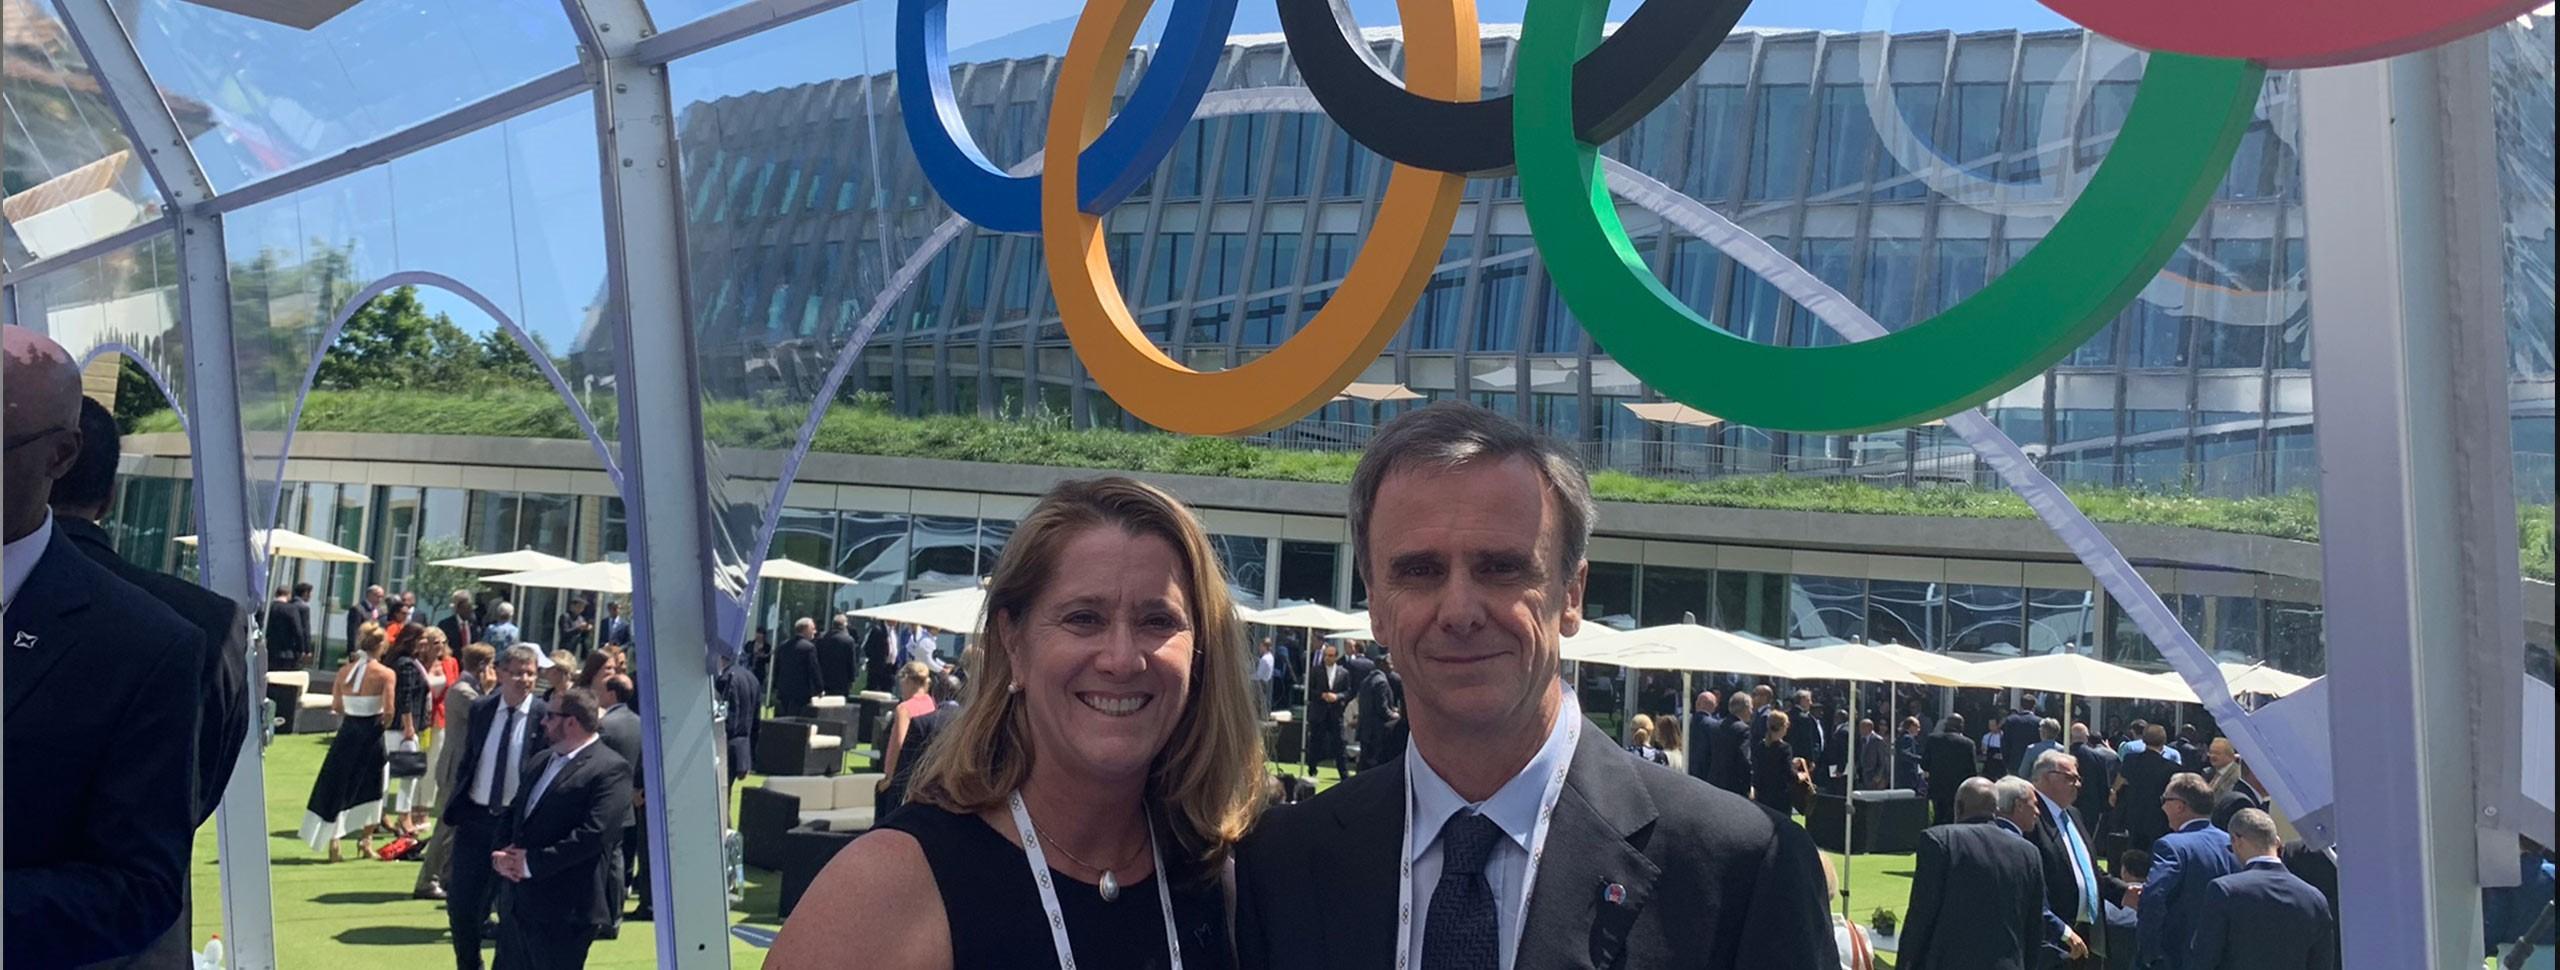 IFSC Attends IOC 125th Anniversary in Lausanne, Switzerland